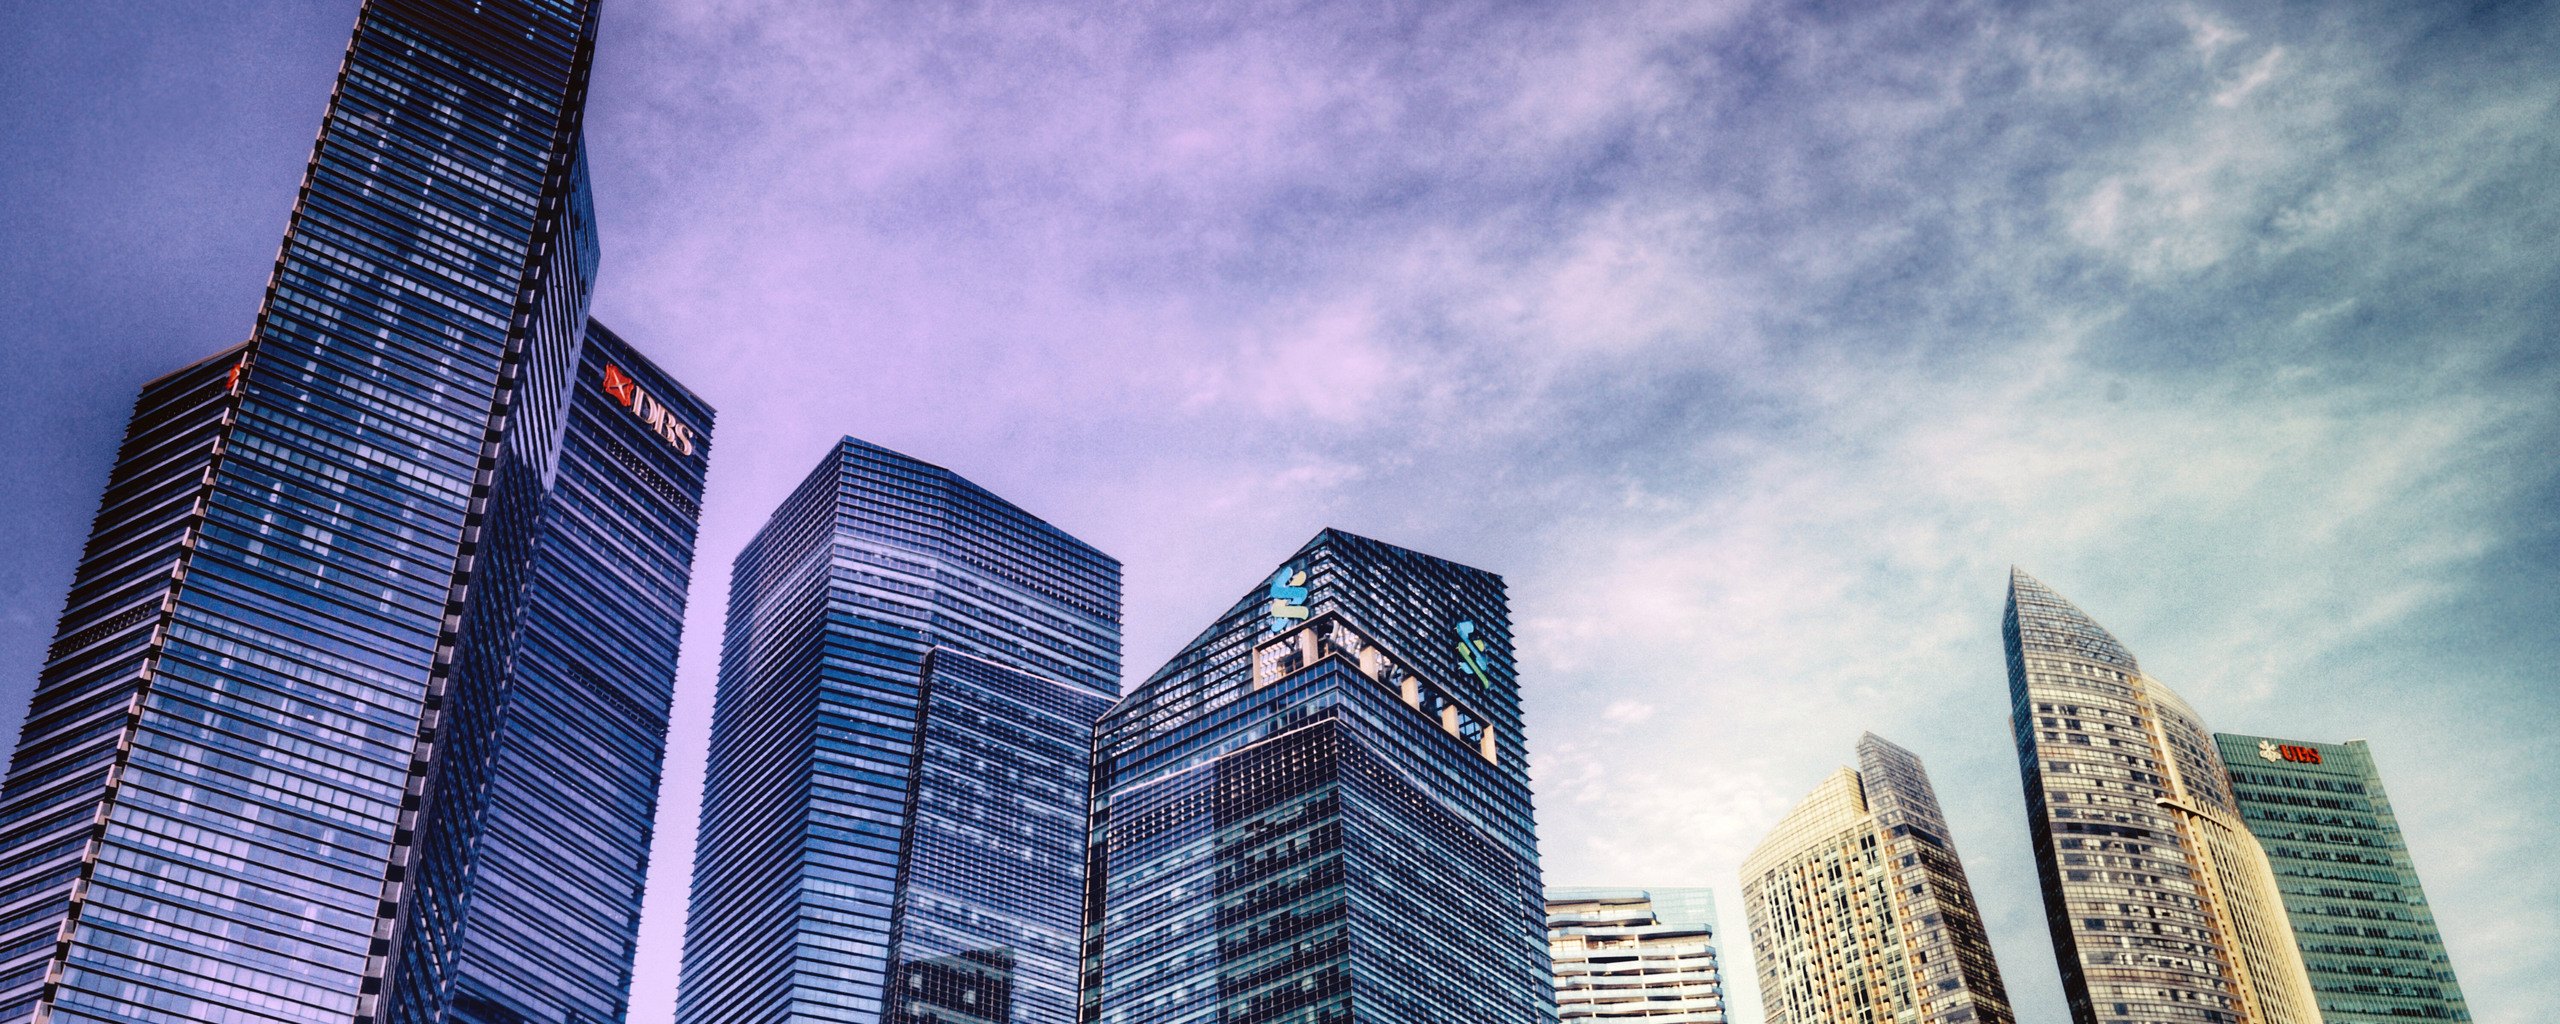 singapore-marina-bay-financial-centre-5k-3w.jpg